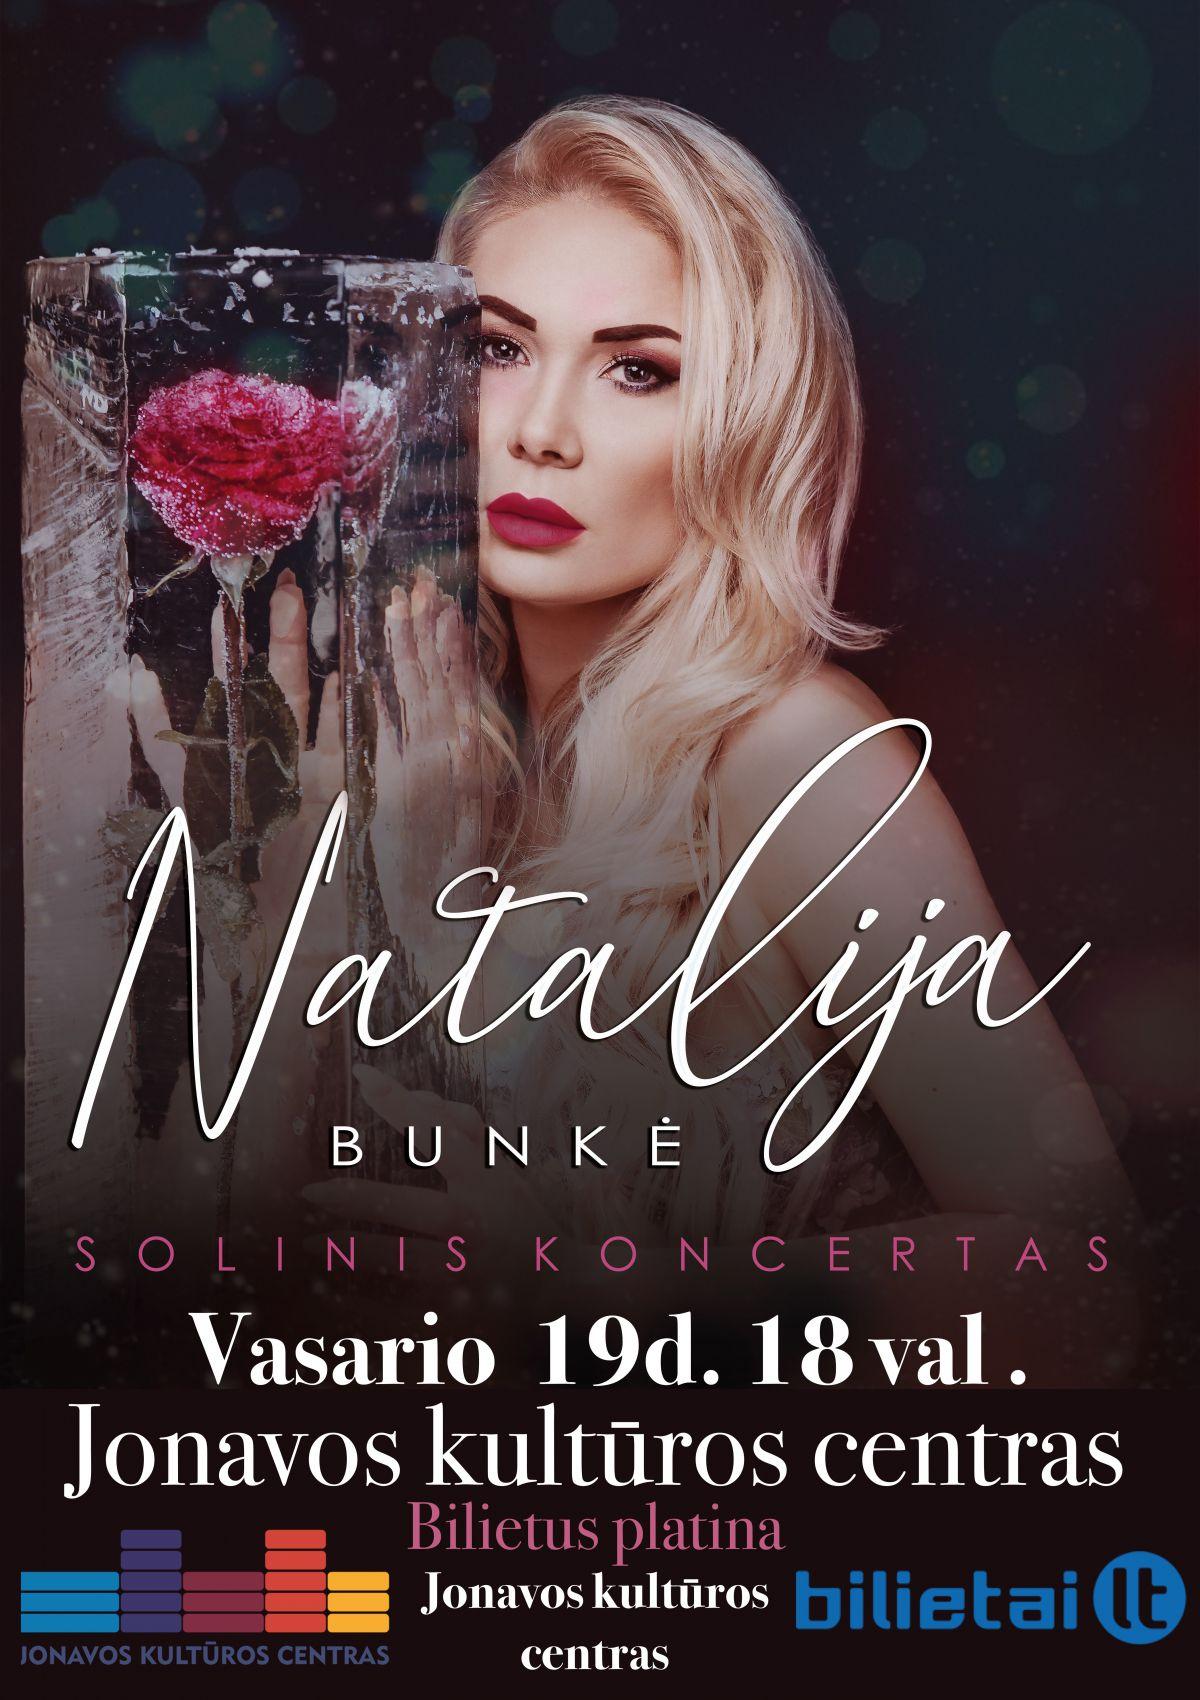 Natalija Bunkė. Solinis koncertas.